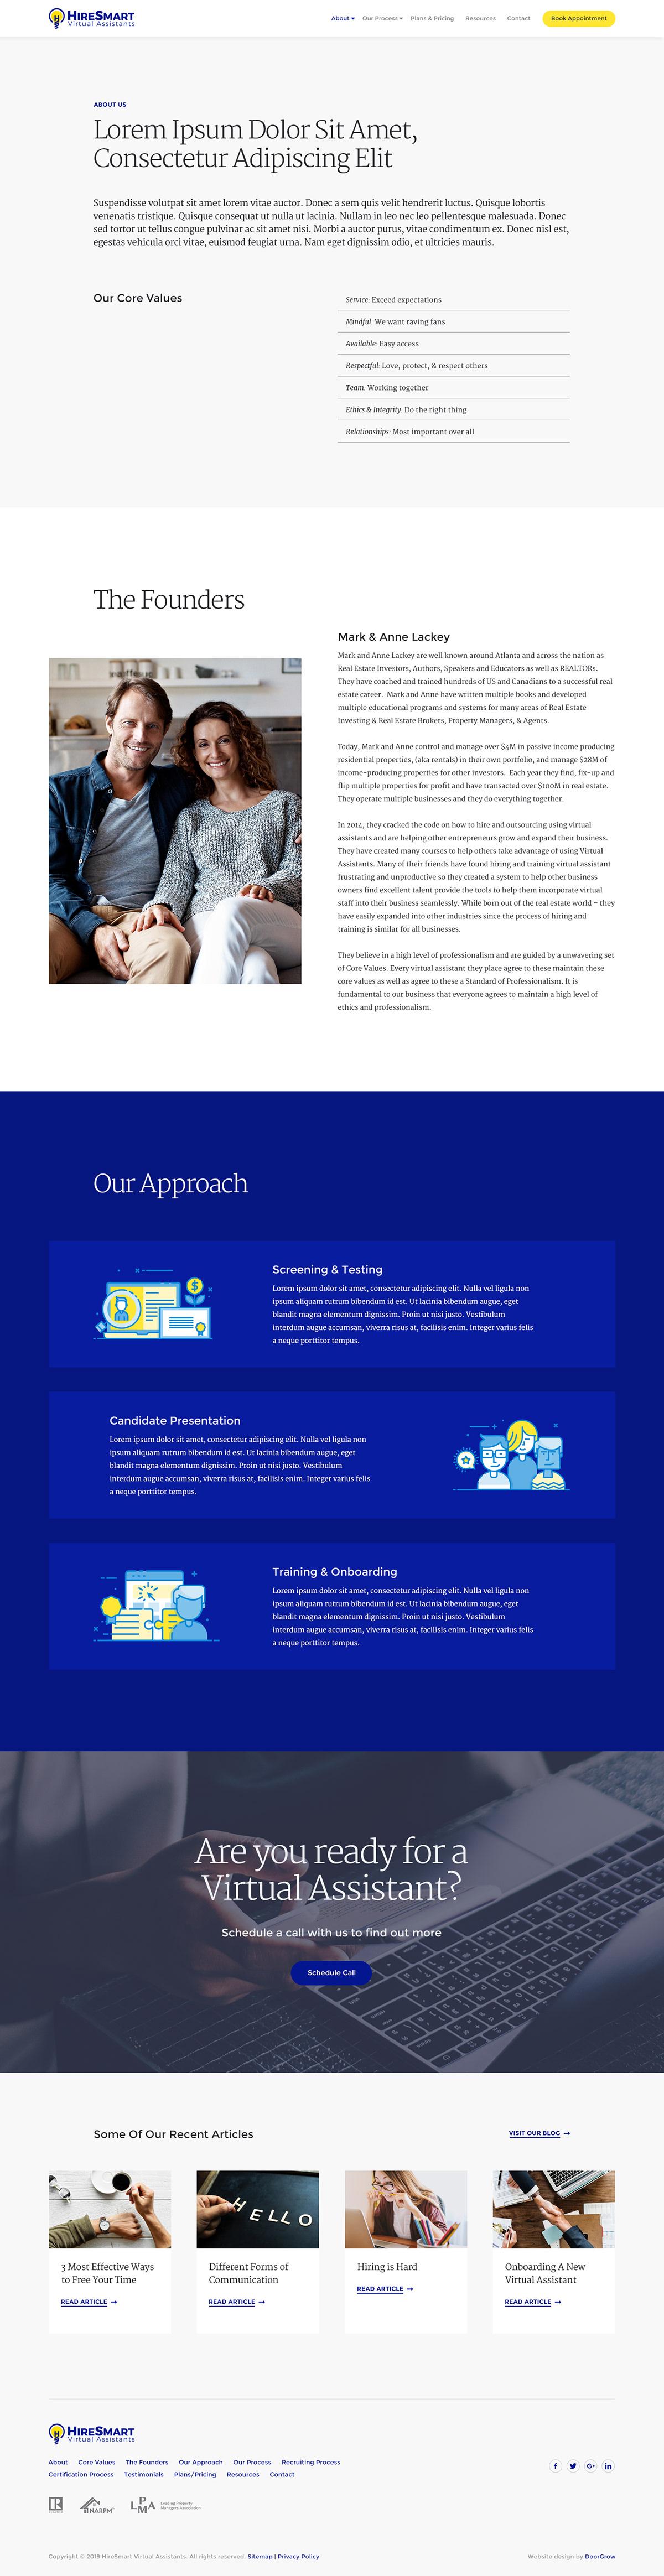 User Experience Design Responsive web design photoshop Illustrator virtual assistants